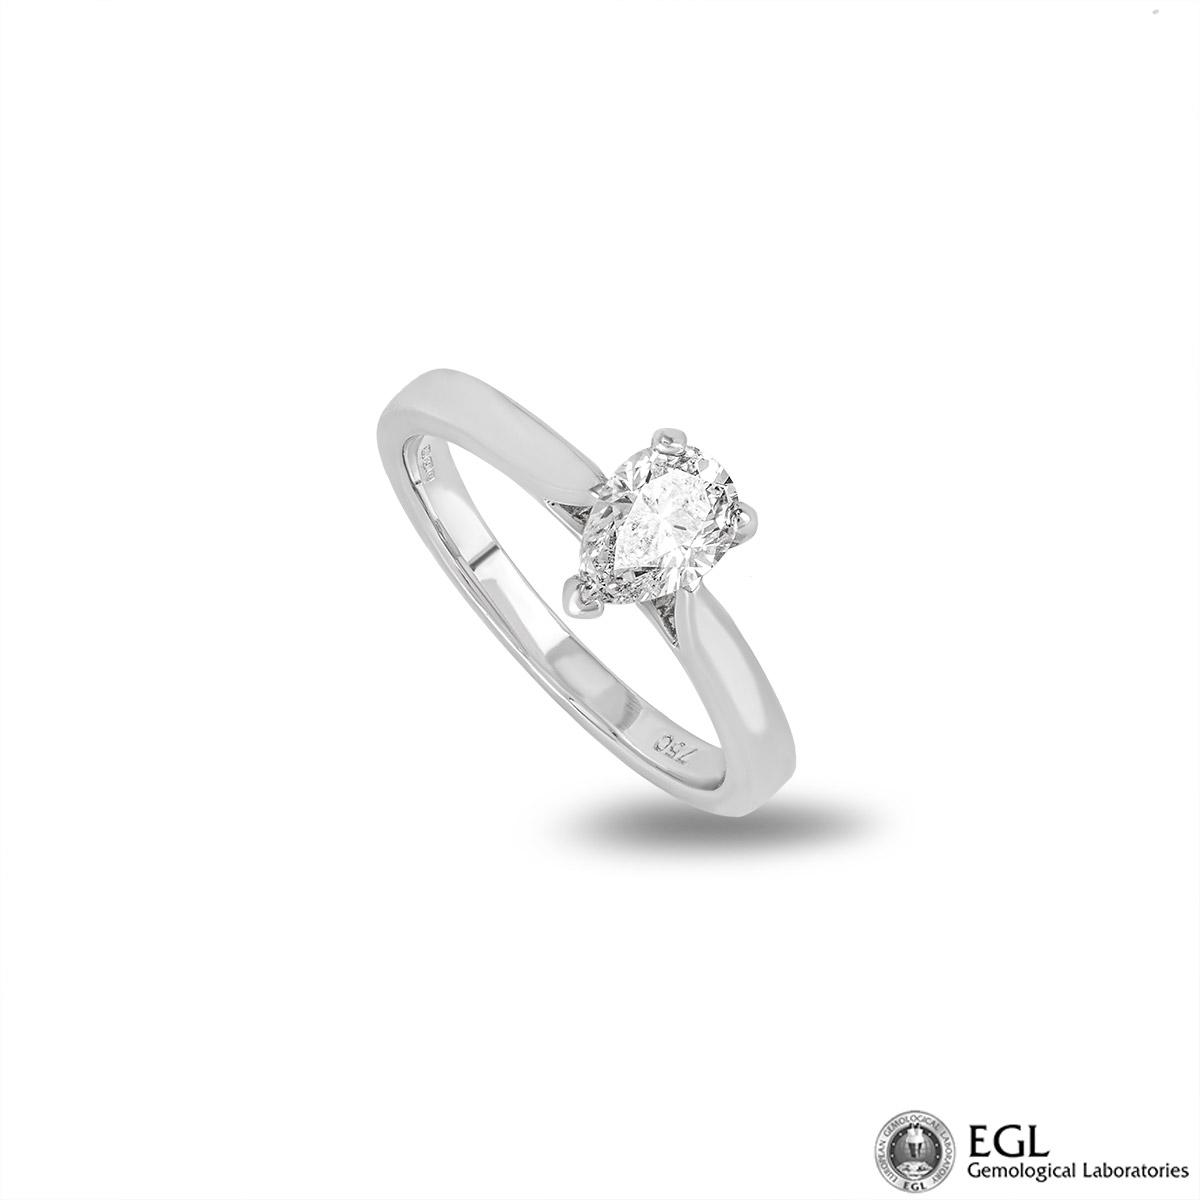 18k White Gold Pear Cut Diamond Ring 0.75ct H/SI2